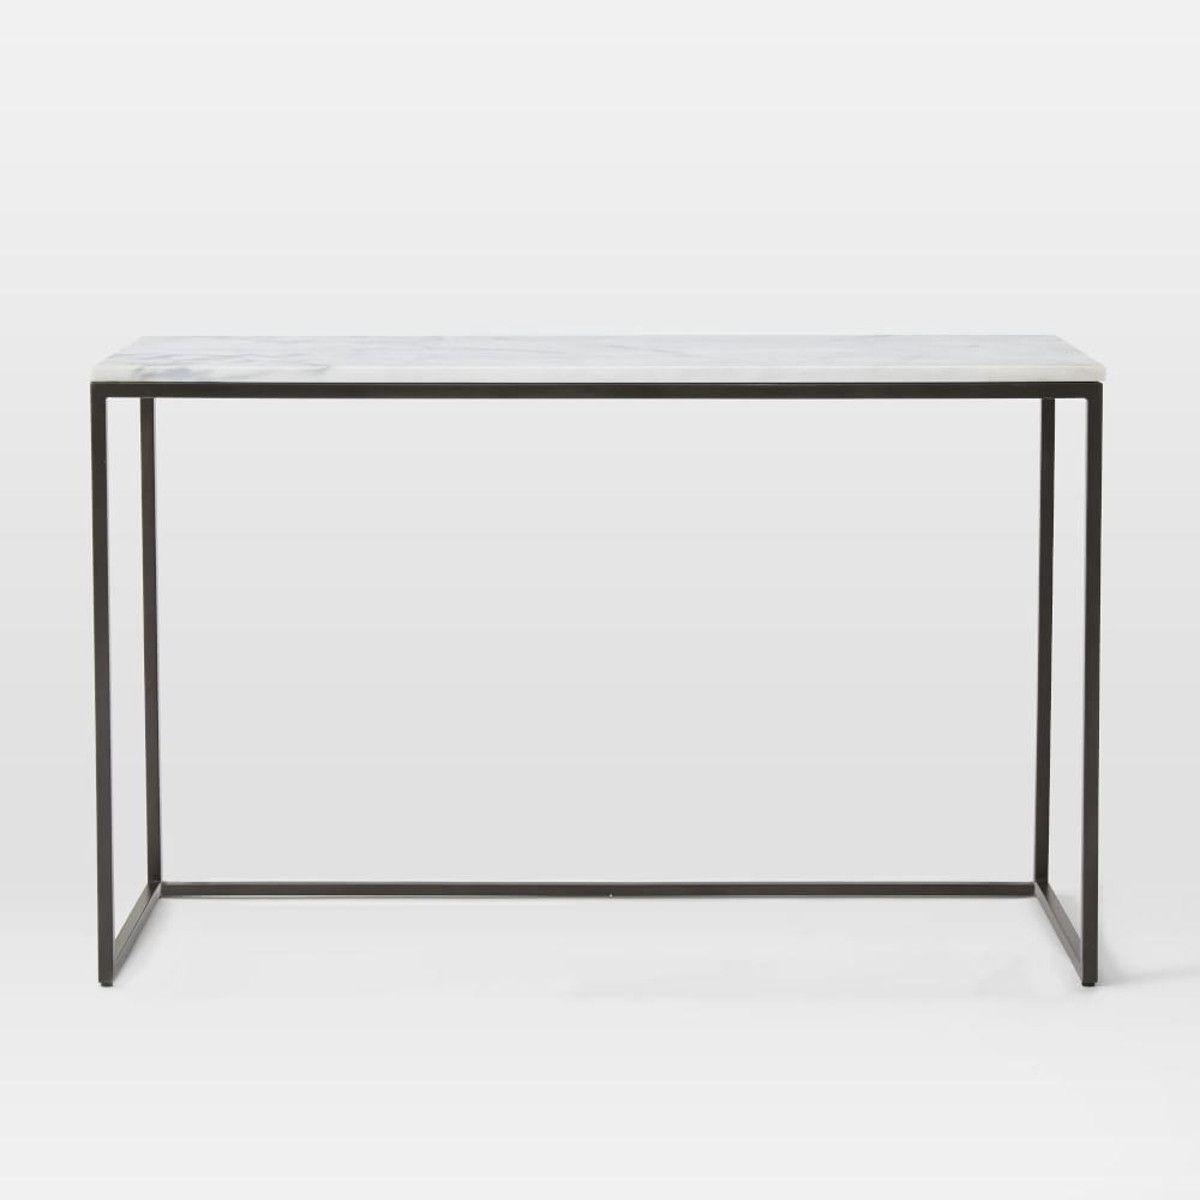 West Elm Dining Table Box Frame